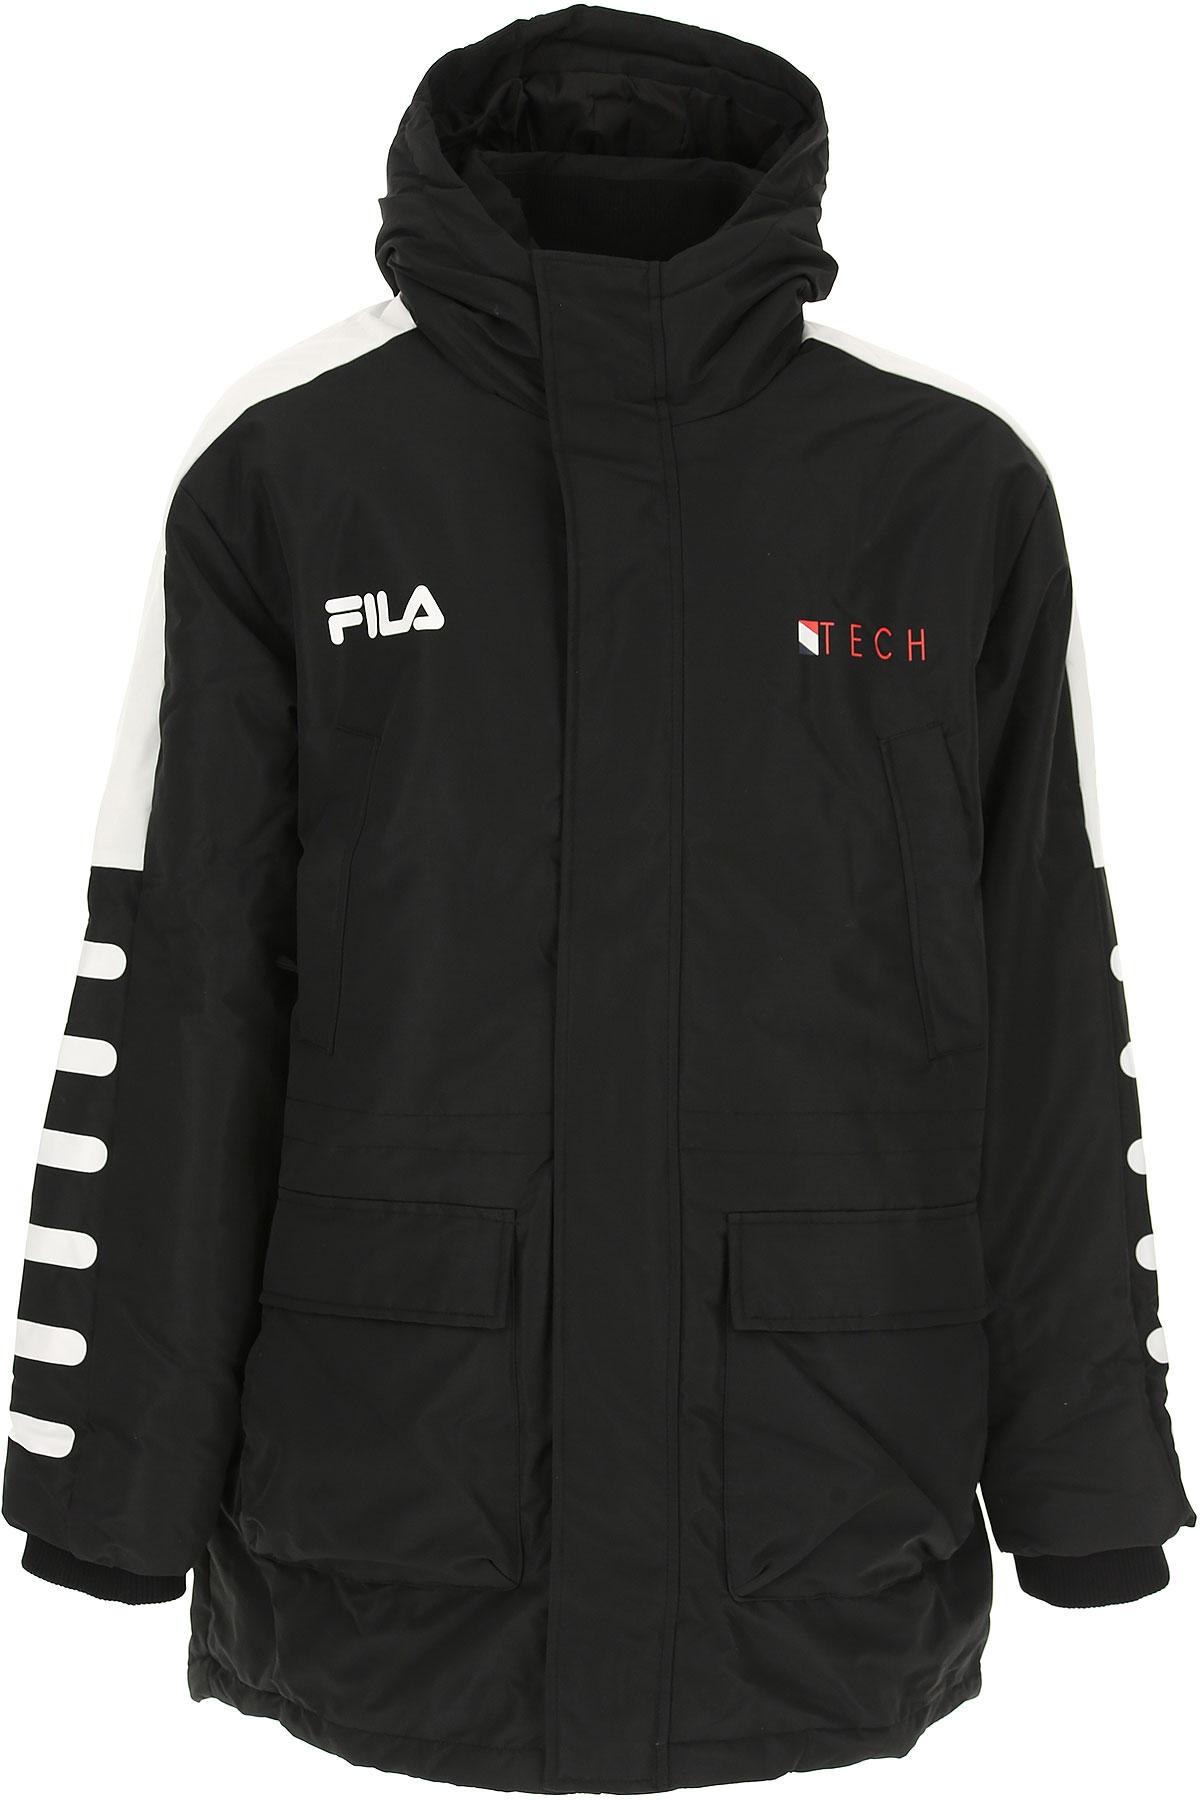 Image of Fila Down Jacket for Men, Puffer Ski Jacket, Black, polyester, 2017, L M S XL